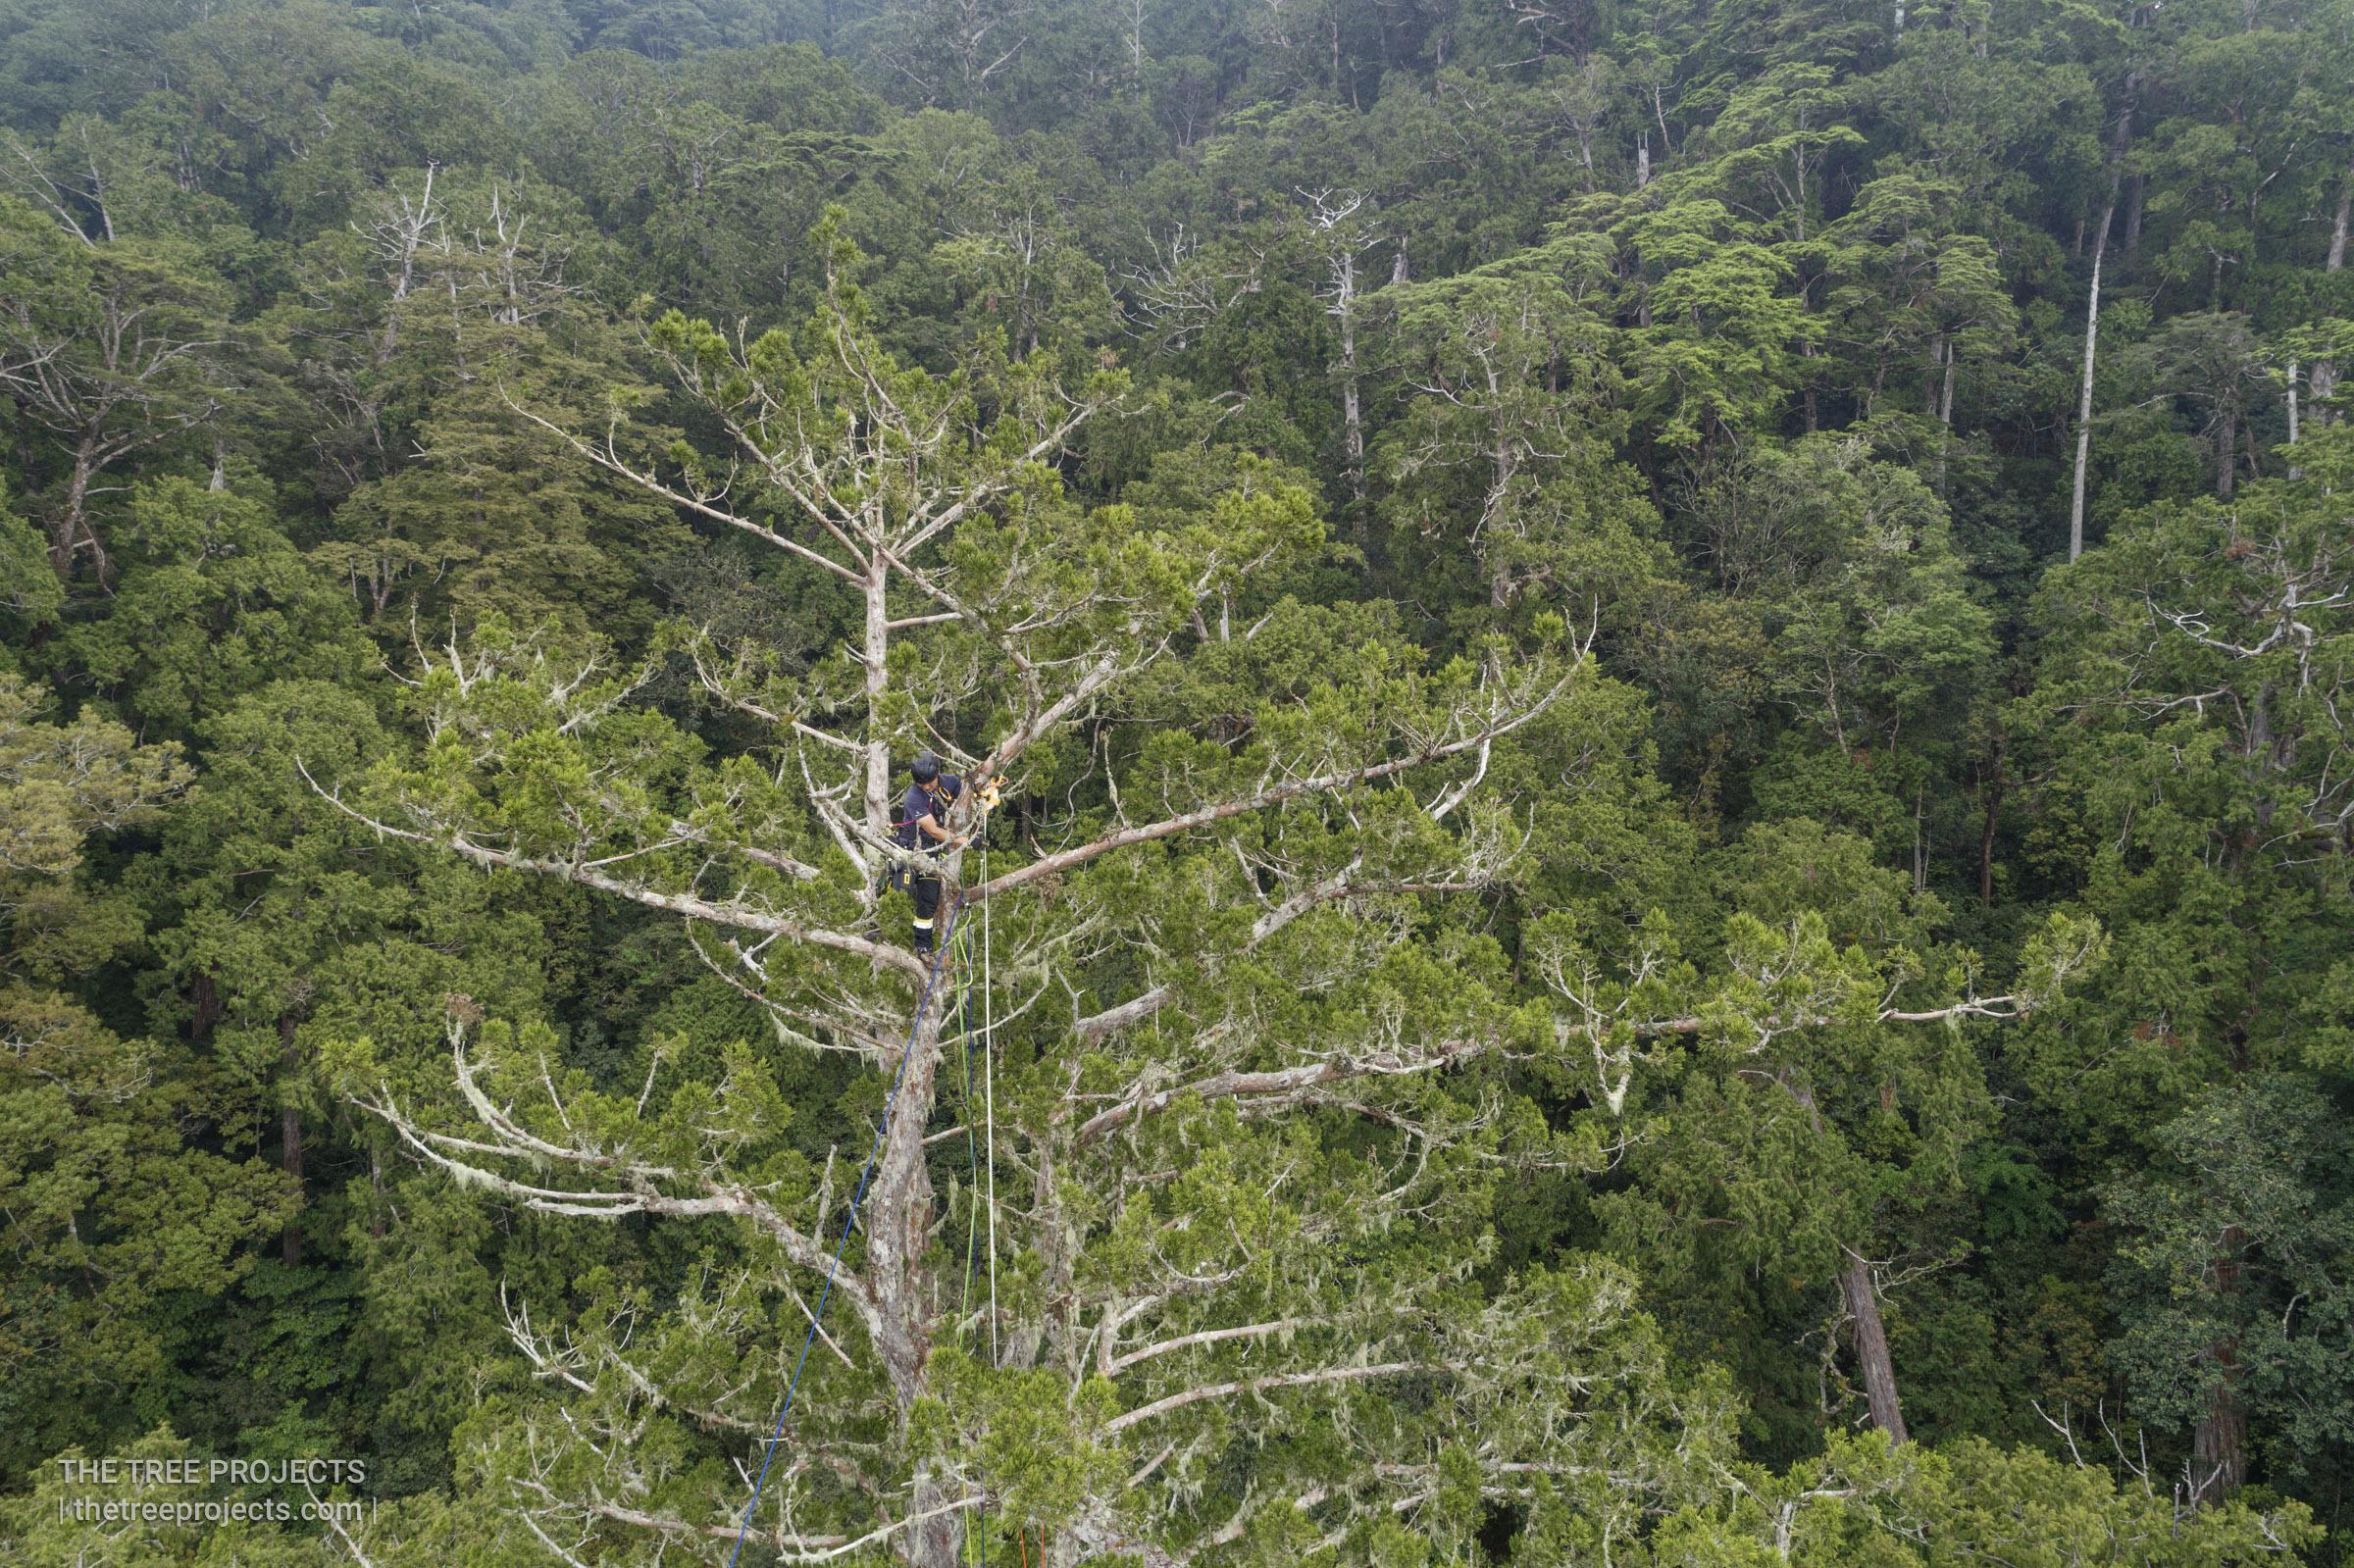 Taiwan-Tree-Project-2017050620170506-DJI_0016.jpg